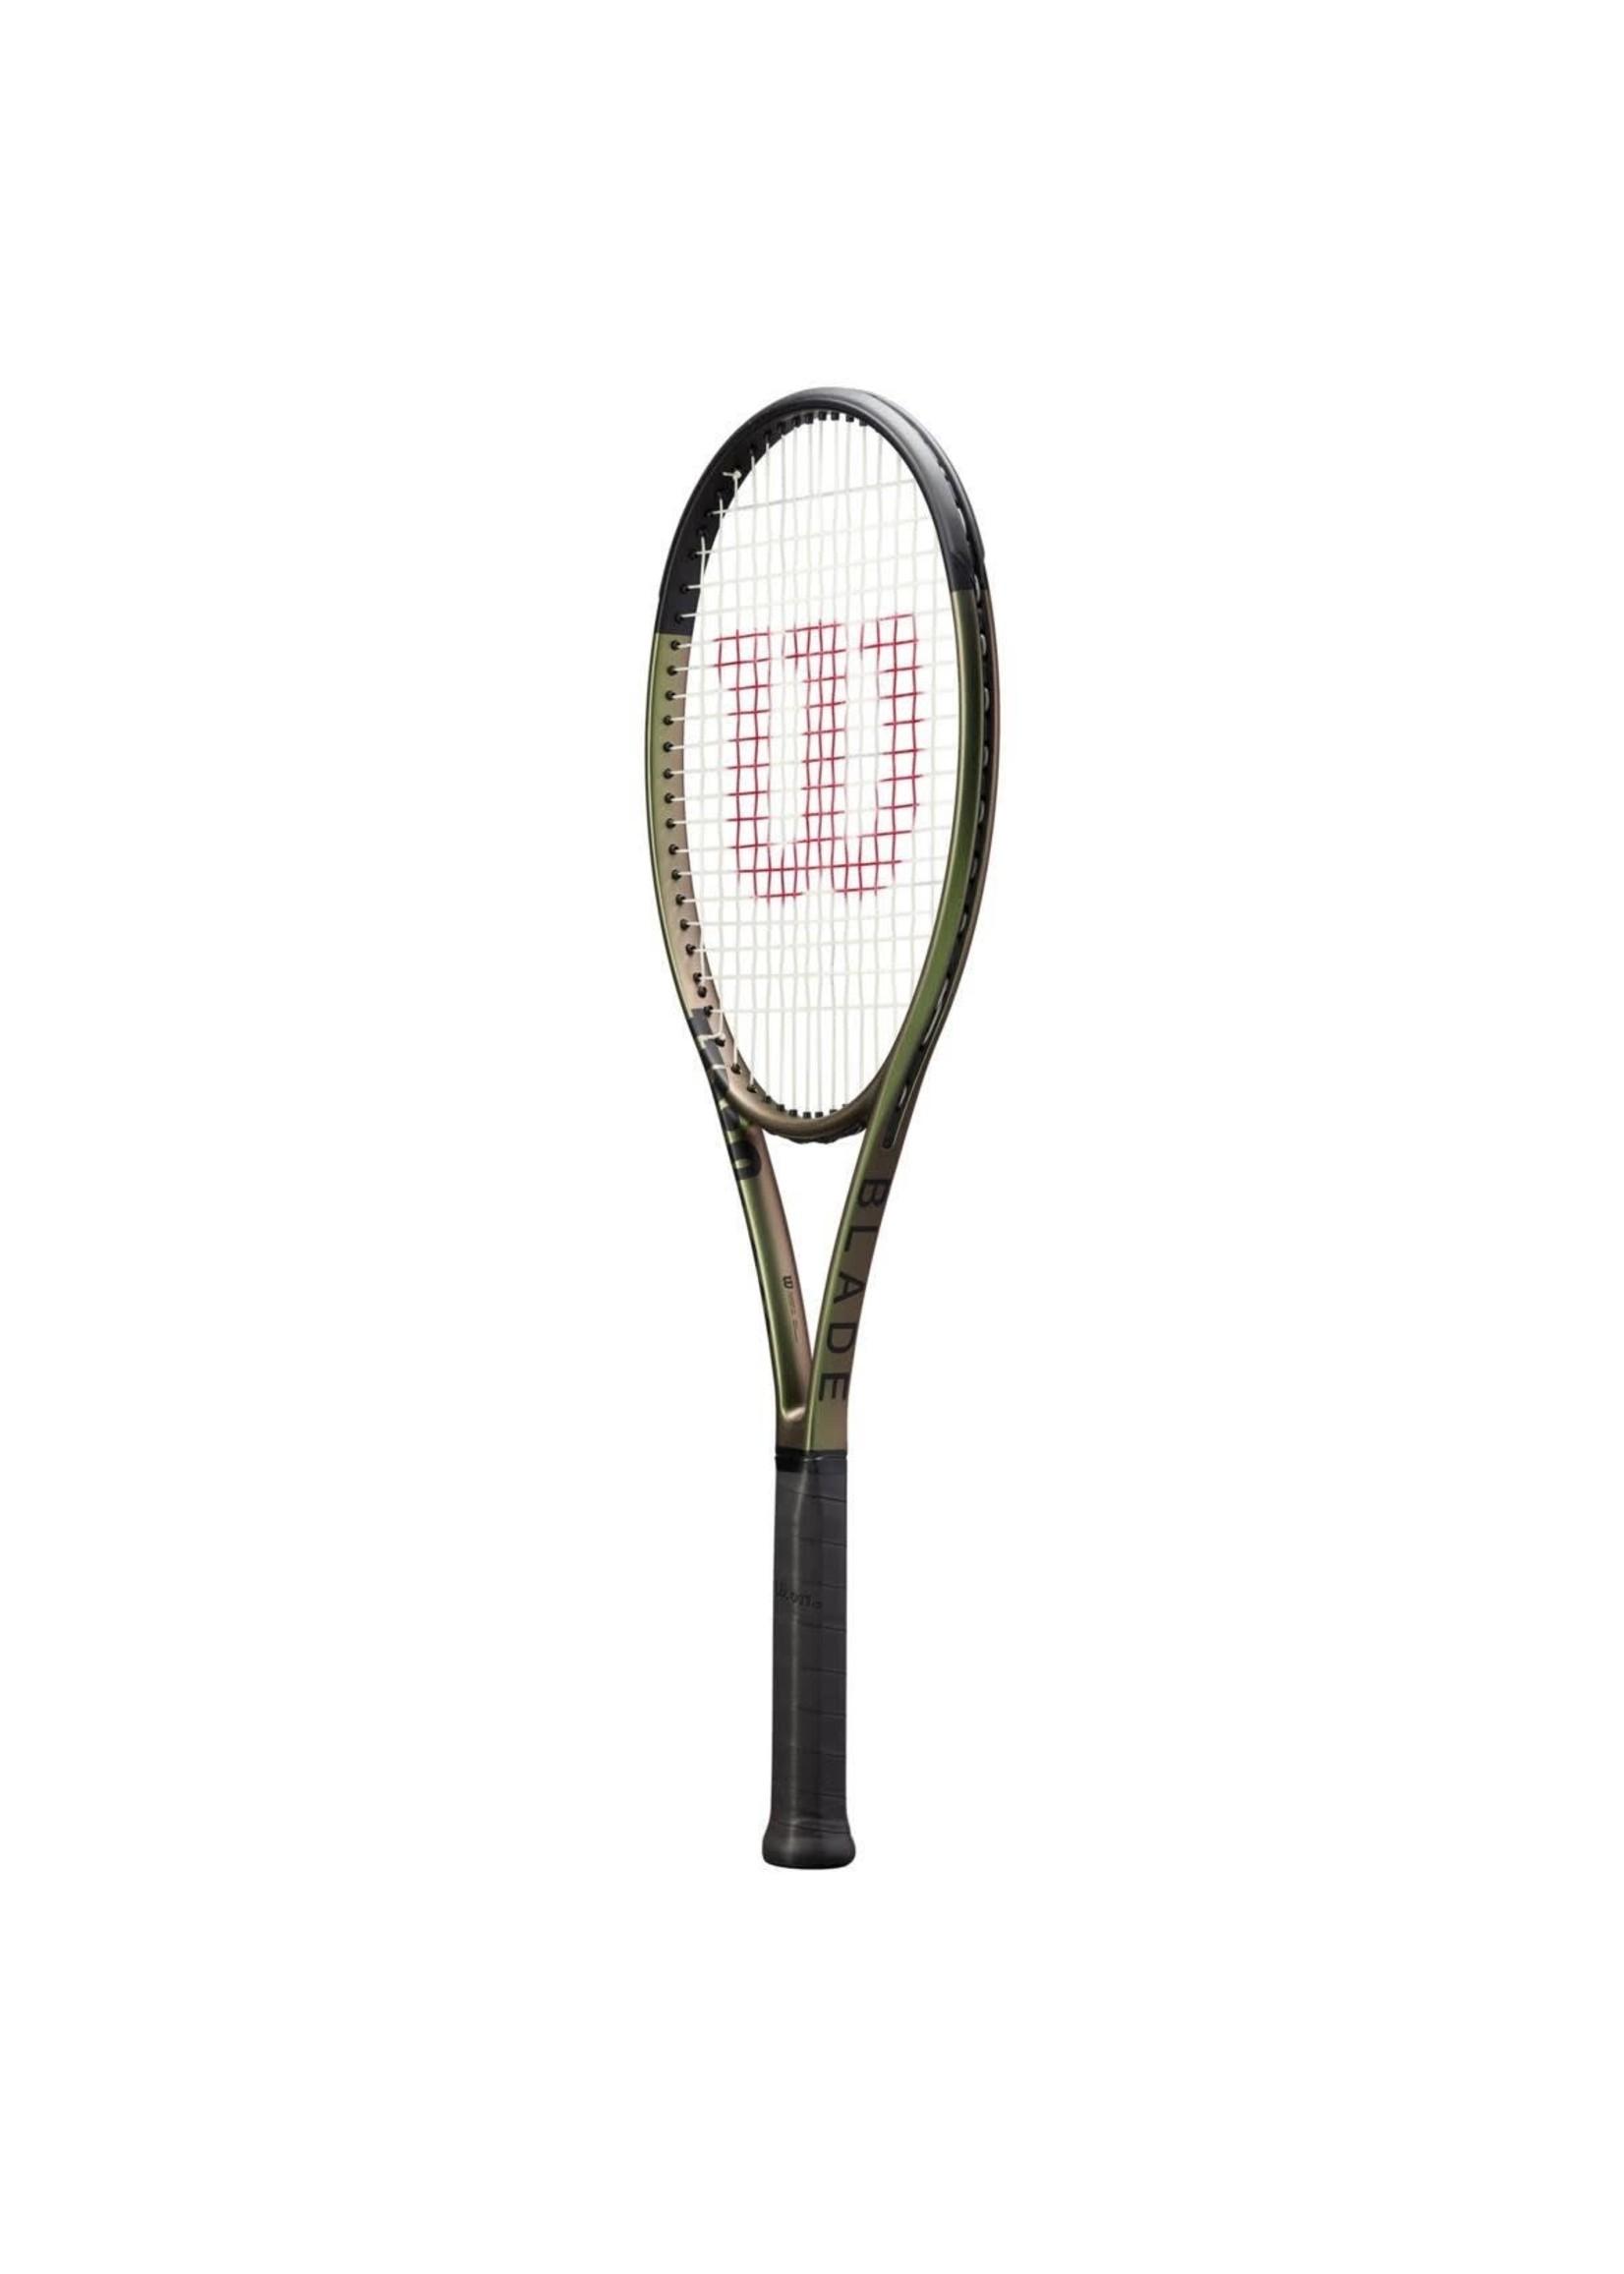 Wilson Wilson Blade 98 (16x19) v8 Tennis Racket (2022)